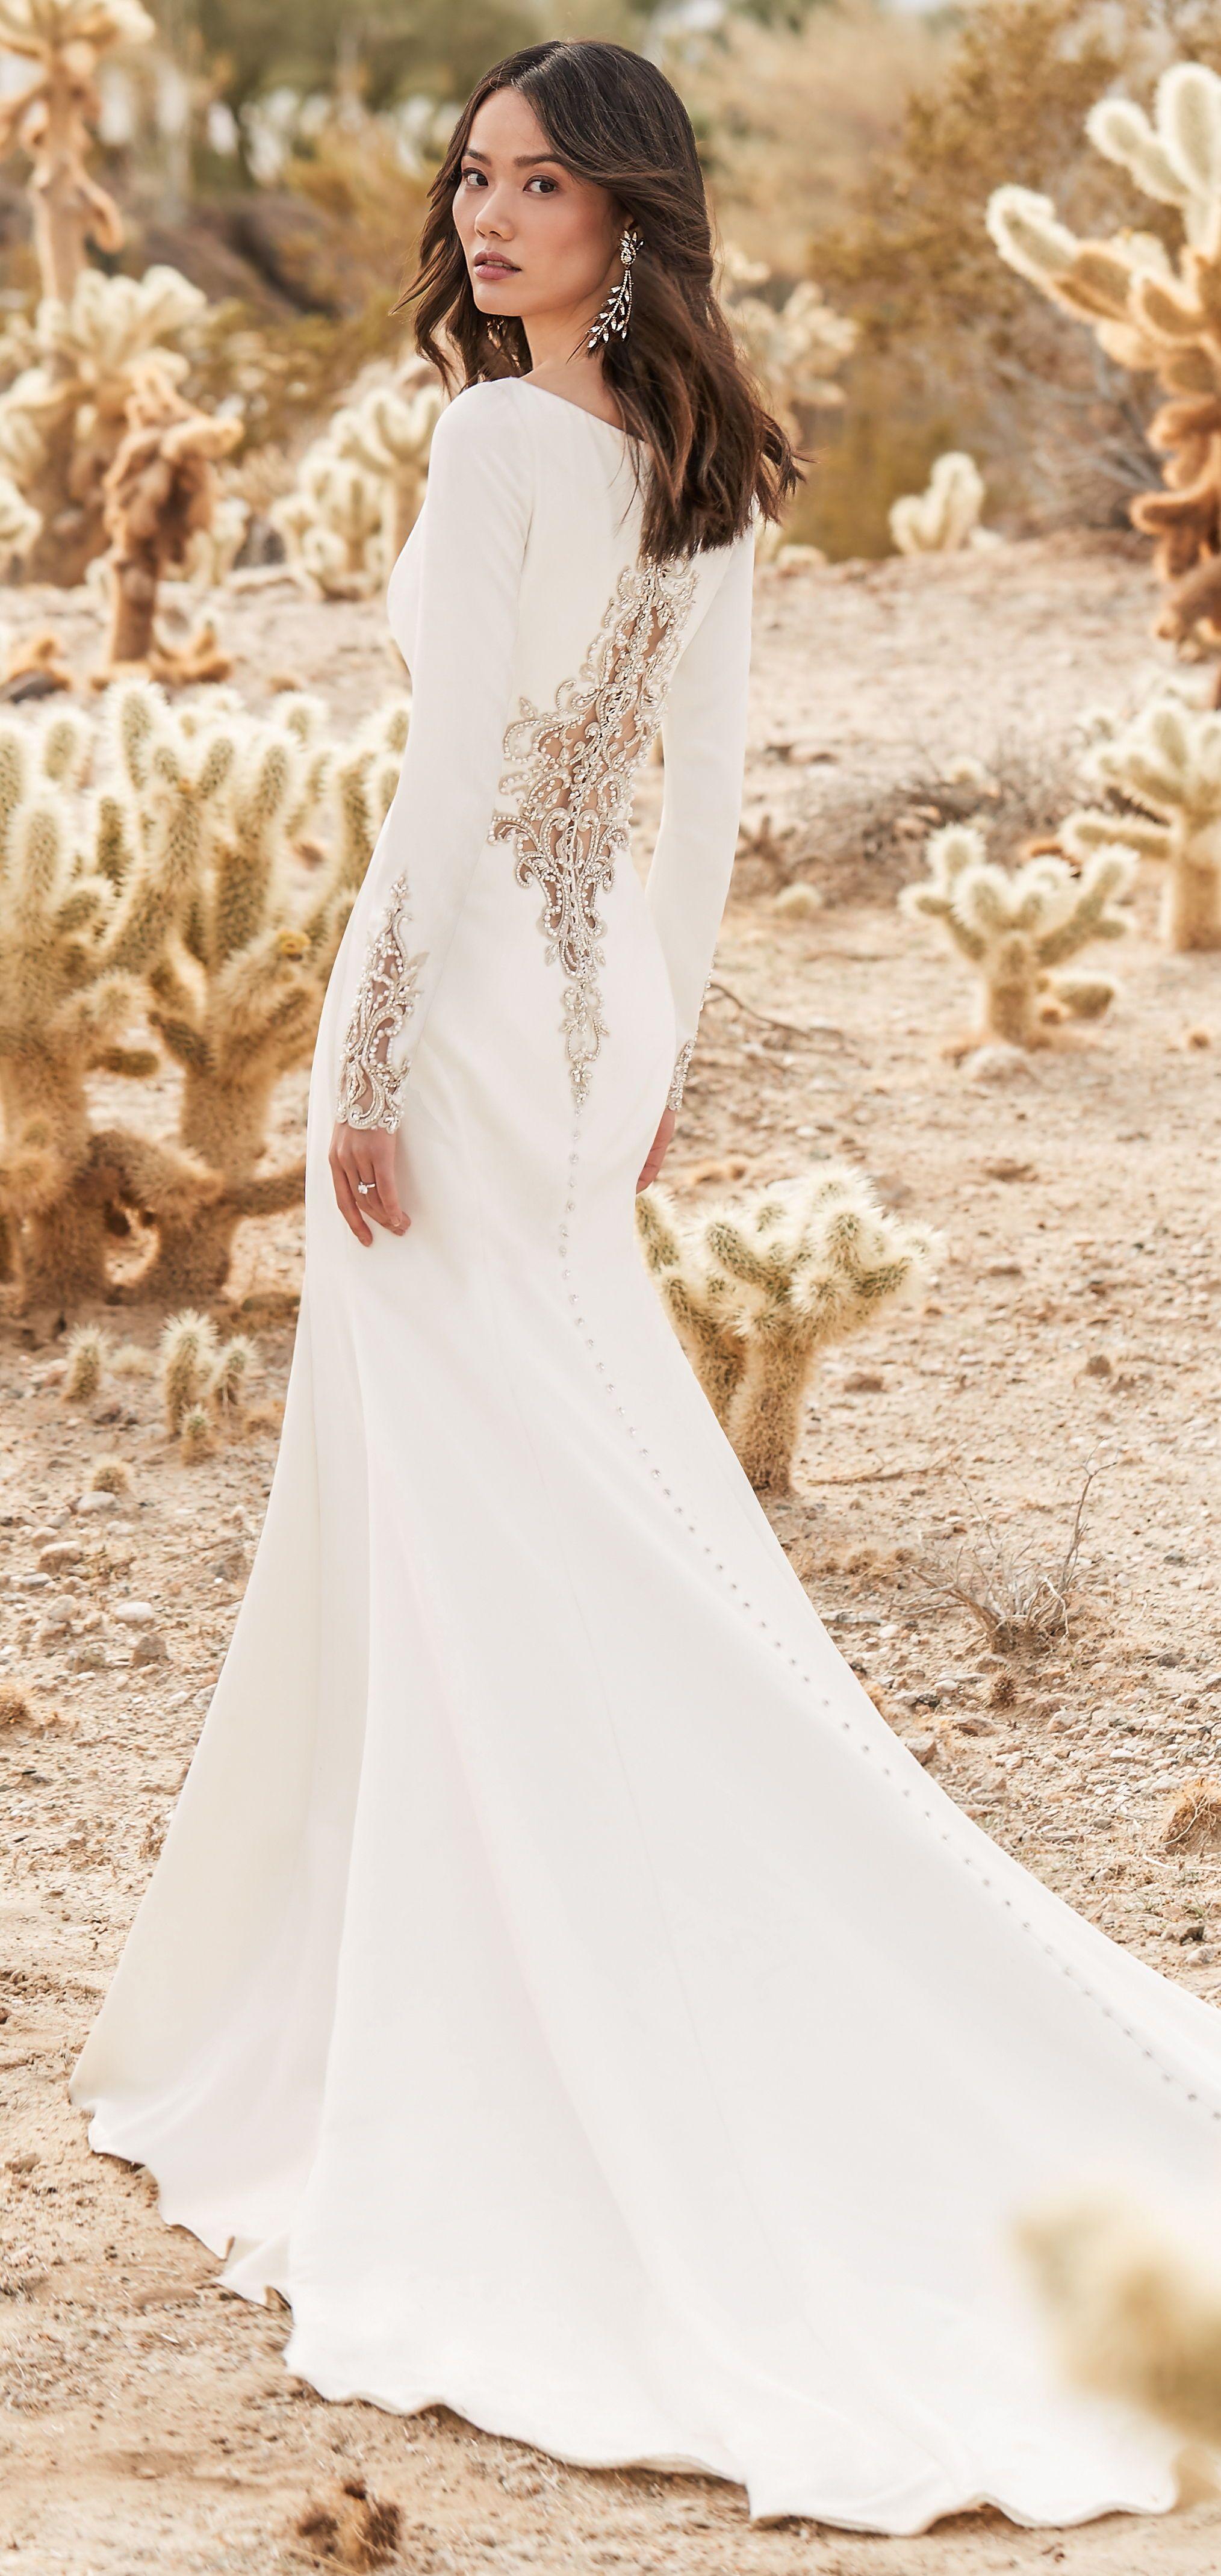 Aston By Sottero And Midgley Wedding Dresses And Accessories Wedding Dress Sleeves Sottero And Midgley Wedding Dresses Bridal Gowns Mermaid [ 4279 x 2028 Pixel ]